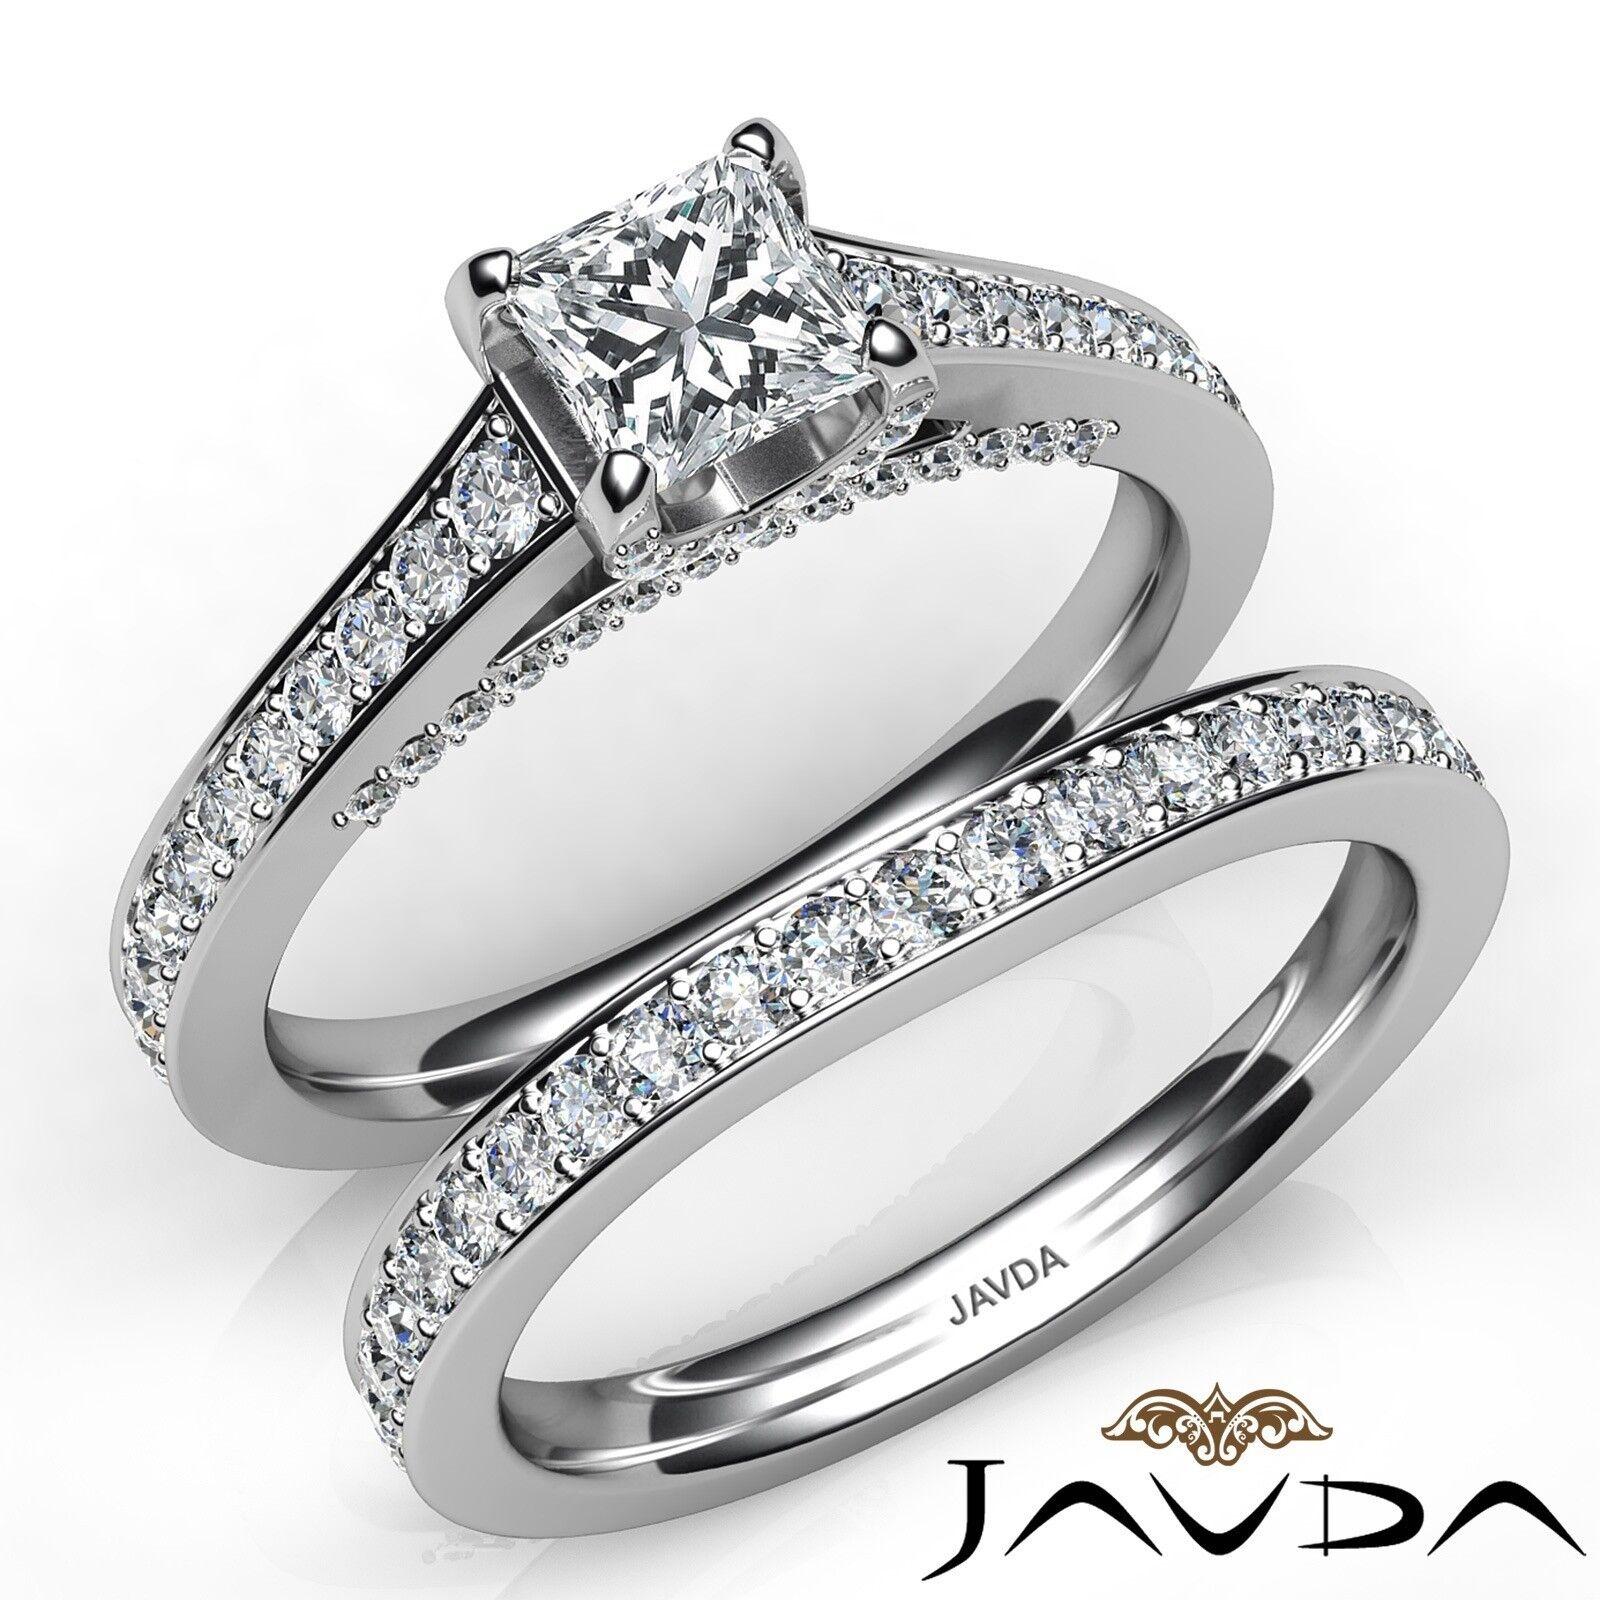 1.75ct Accent Bridge Pave Bridal Princess Diamond Engagement Ring GIA F-VS1 Gold